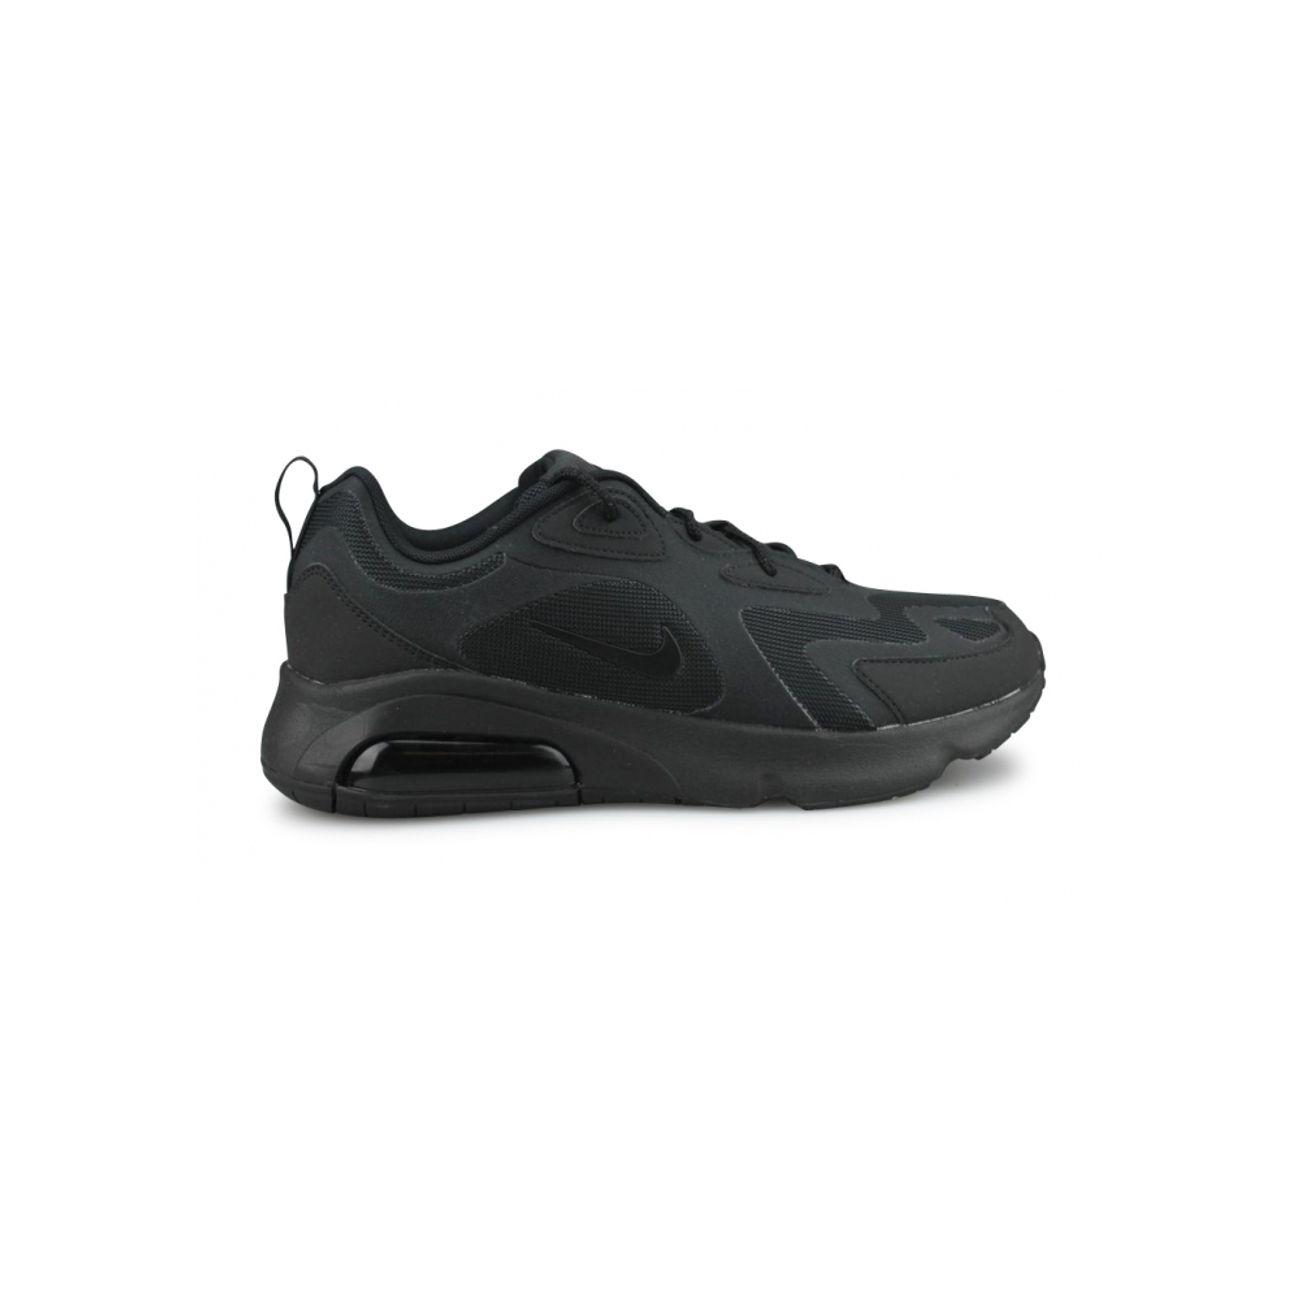 Mode Lifestyle homme NIKE Basket Nike Air Max 200 Noir Aq2568 003